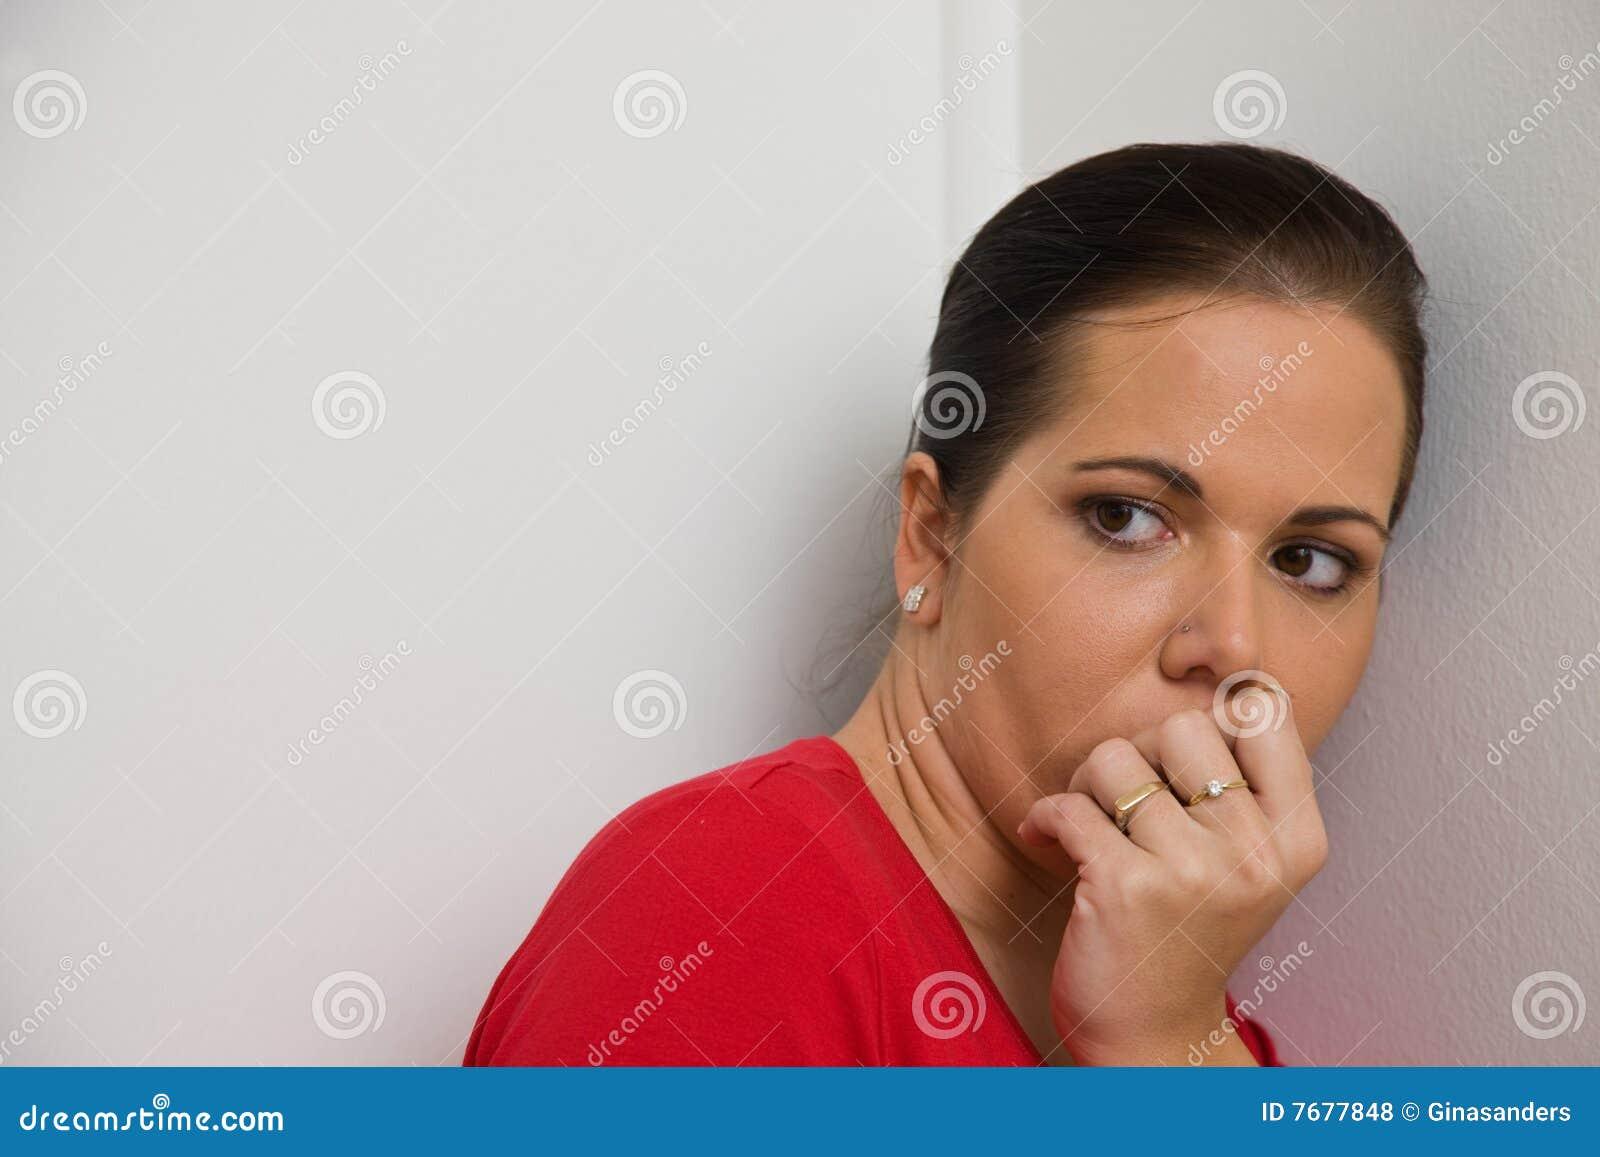 Anxious woman symbol of violence in the family stock photo image royalty free stock photo buycottarizona Choice Image